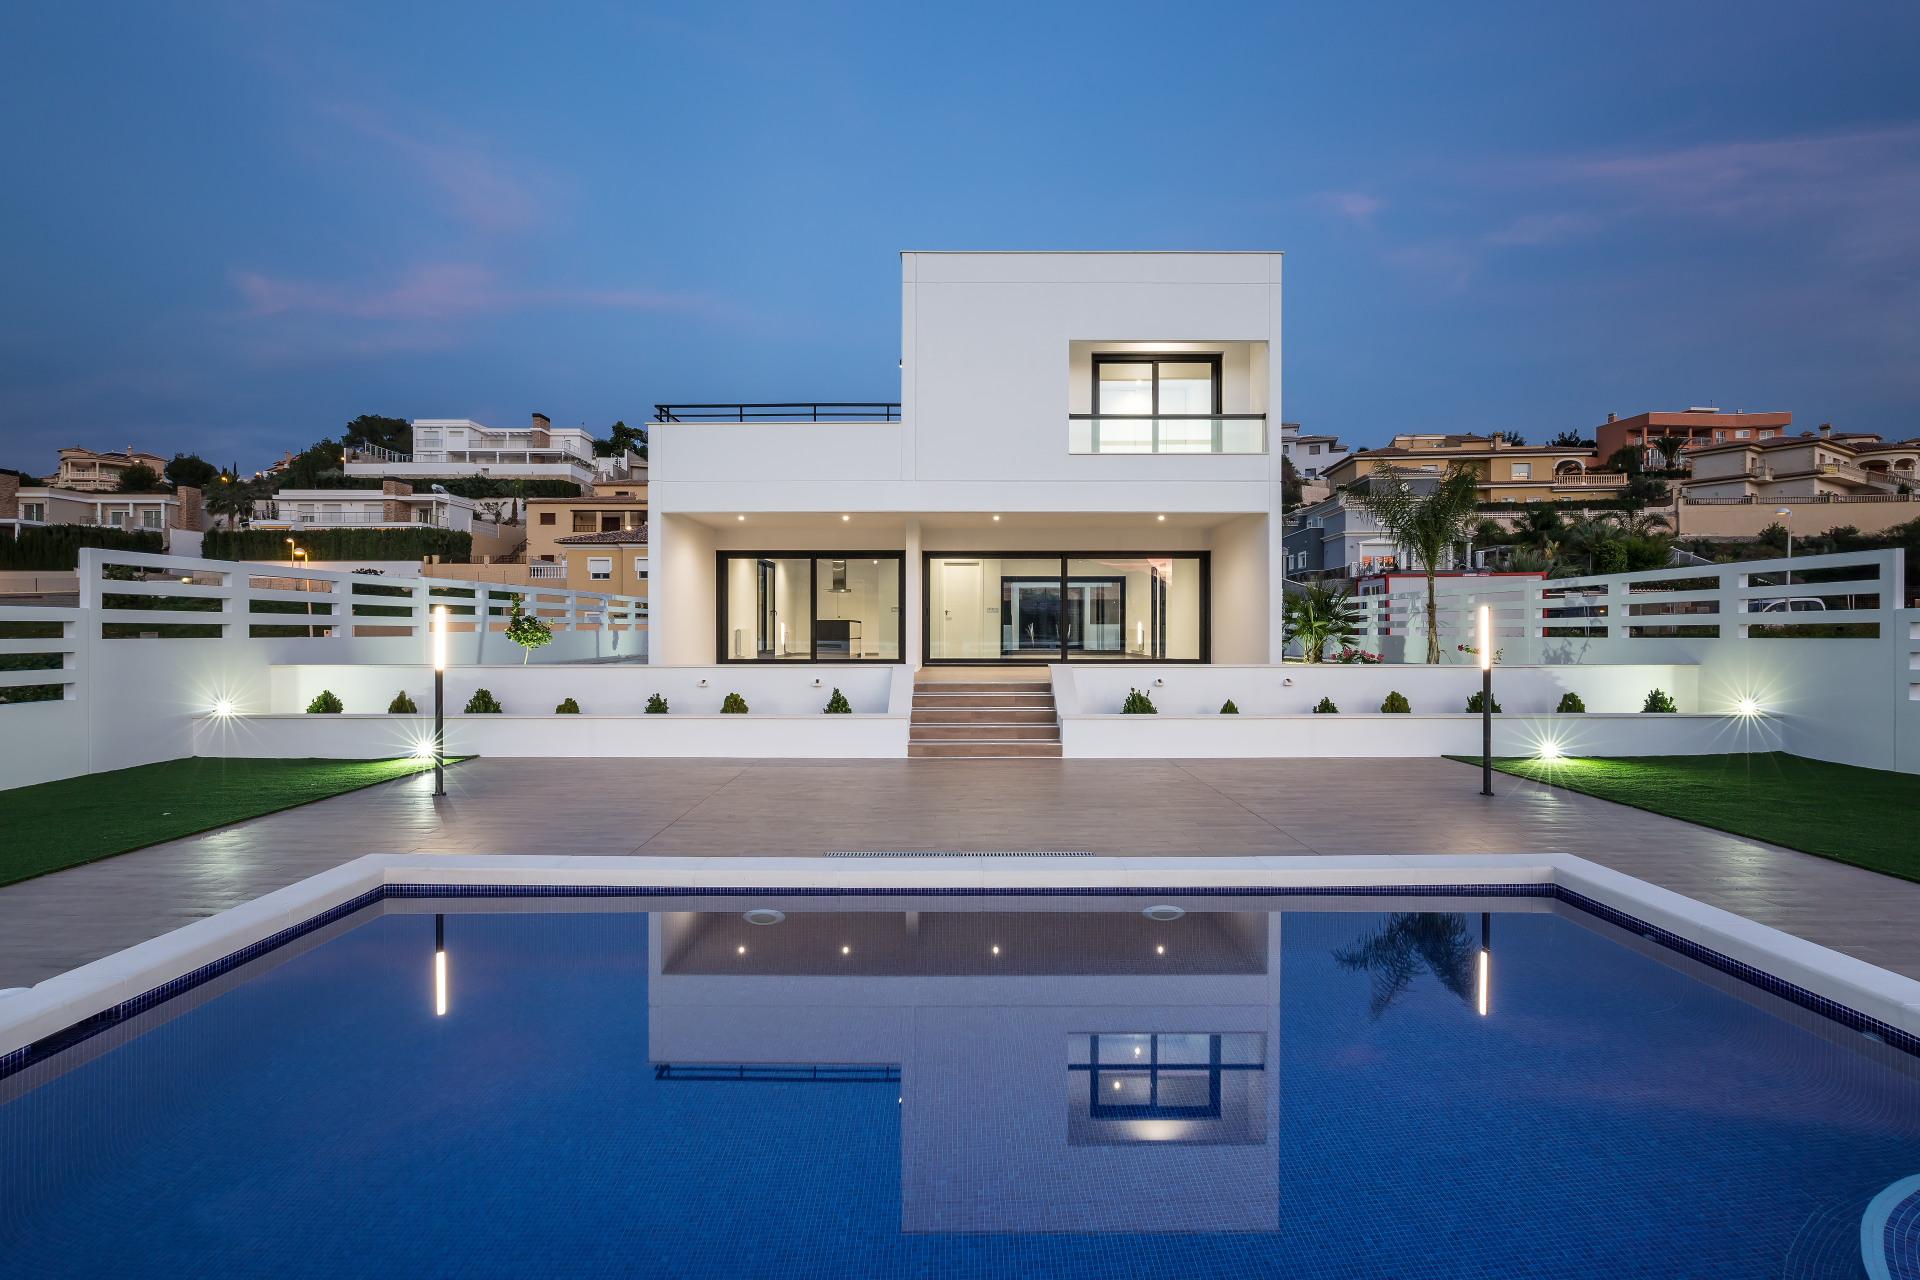 fotografia-arquitectura-valencia-german-cabo-viraje-vivienda-unifamiliar-calpe (47)